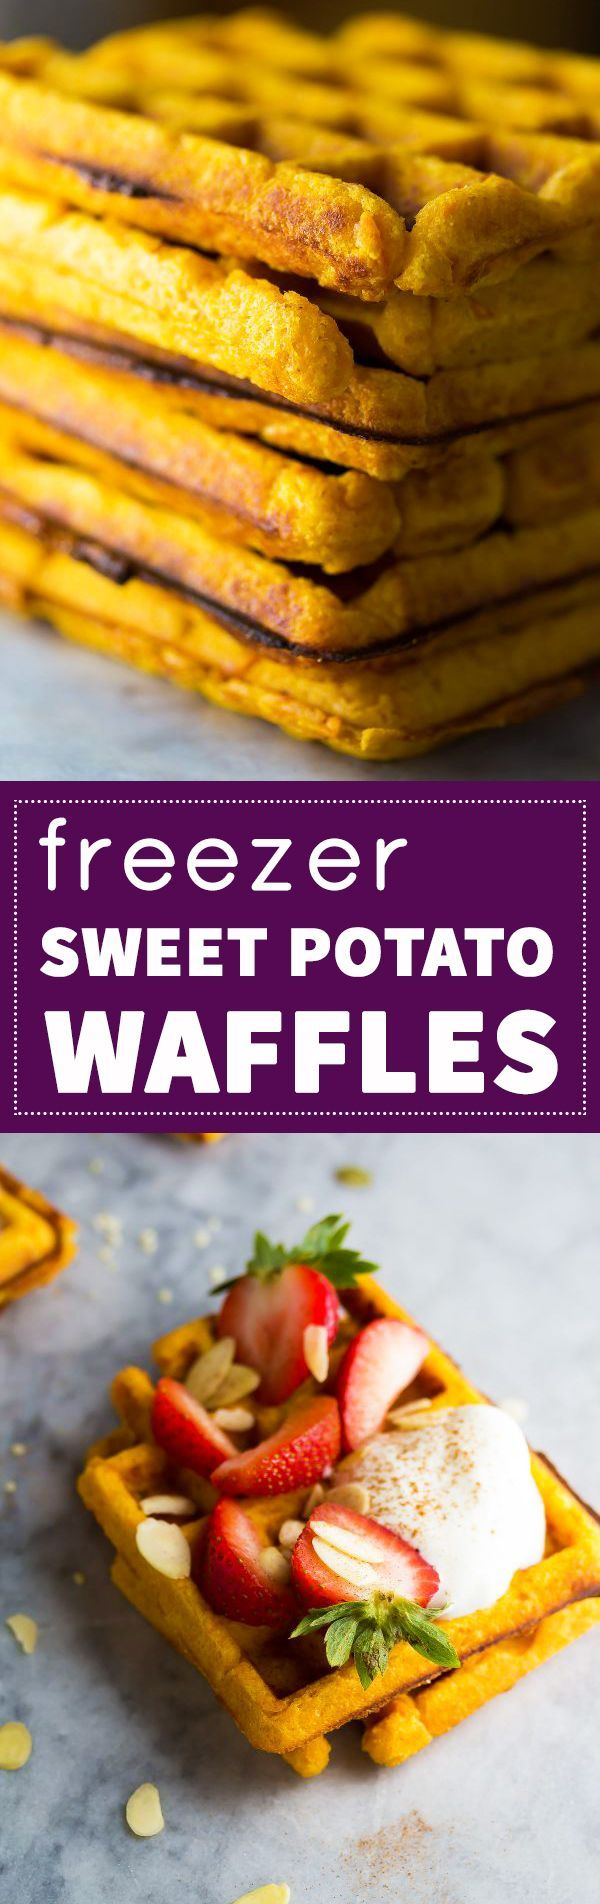 Freezer Sweet Potato Waffles ~ Make breakfast SO easy in the morning!  Plus 3 topping ideas.